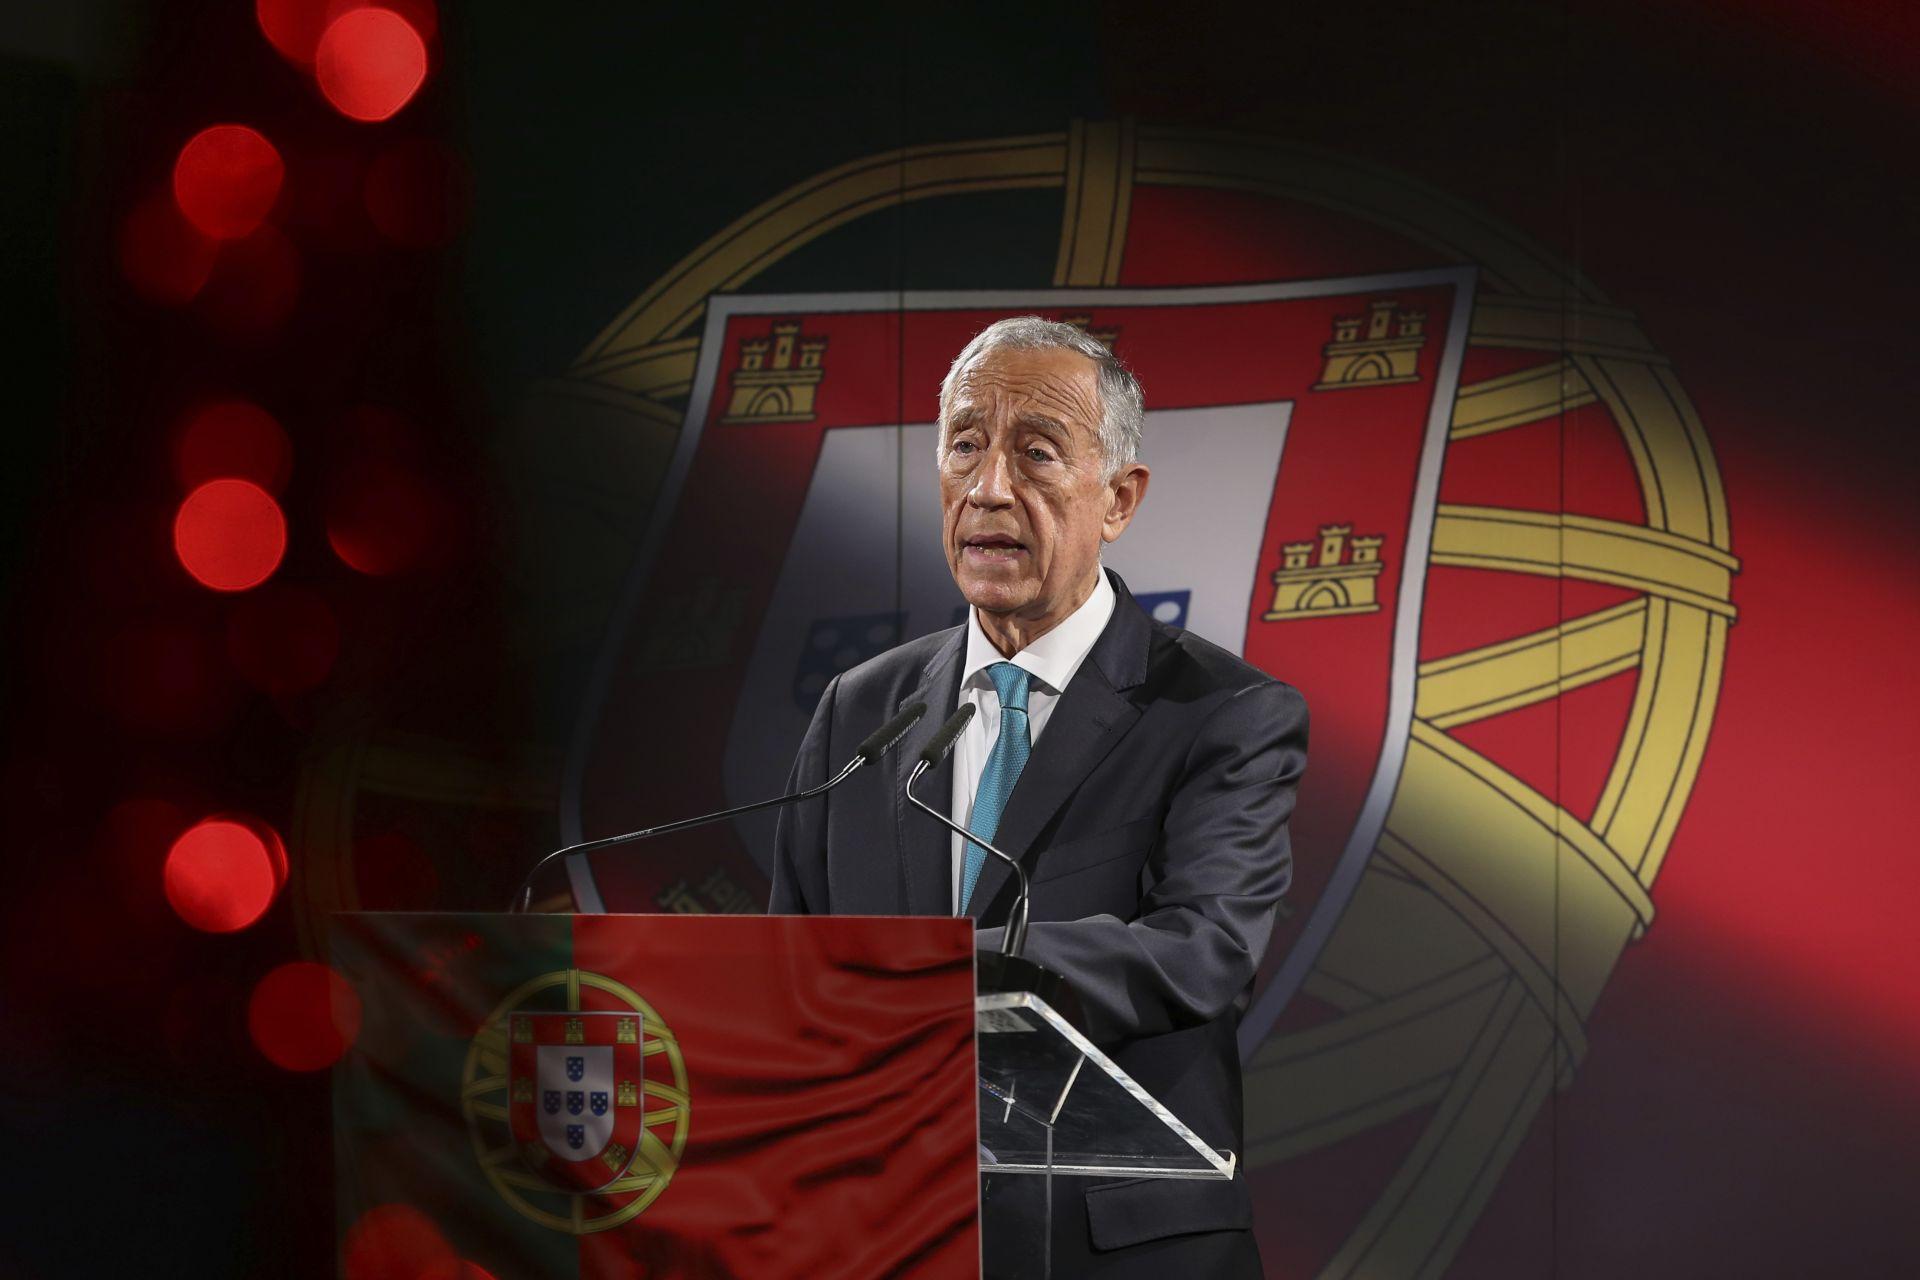 Досегашния президент консерватор Марселу Ребелу де Соуз